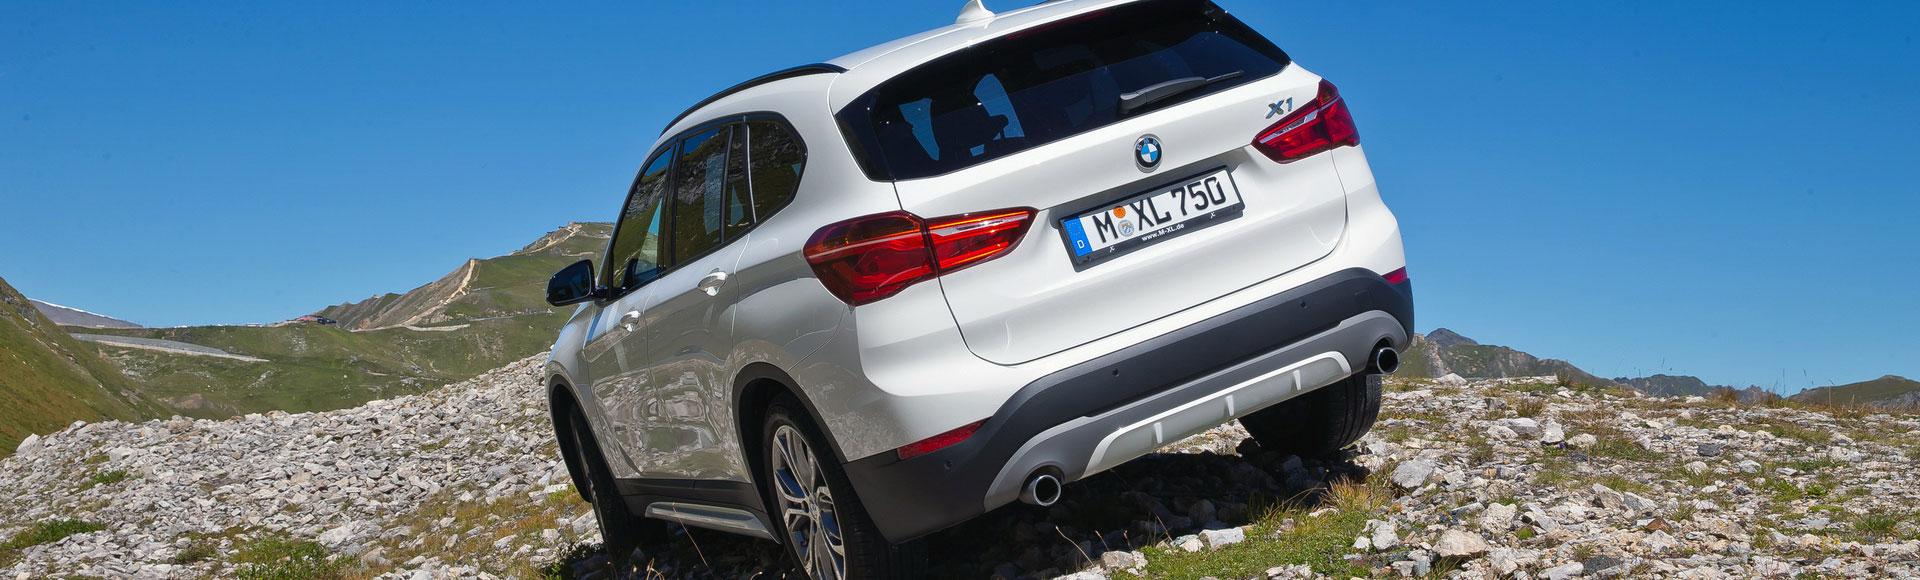 BMW X1 2016 212 Sommer Herbst